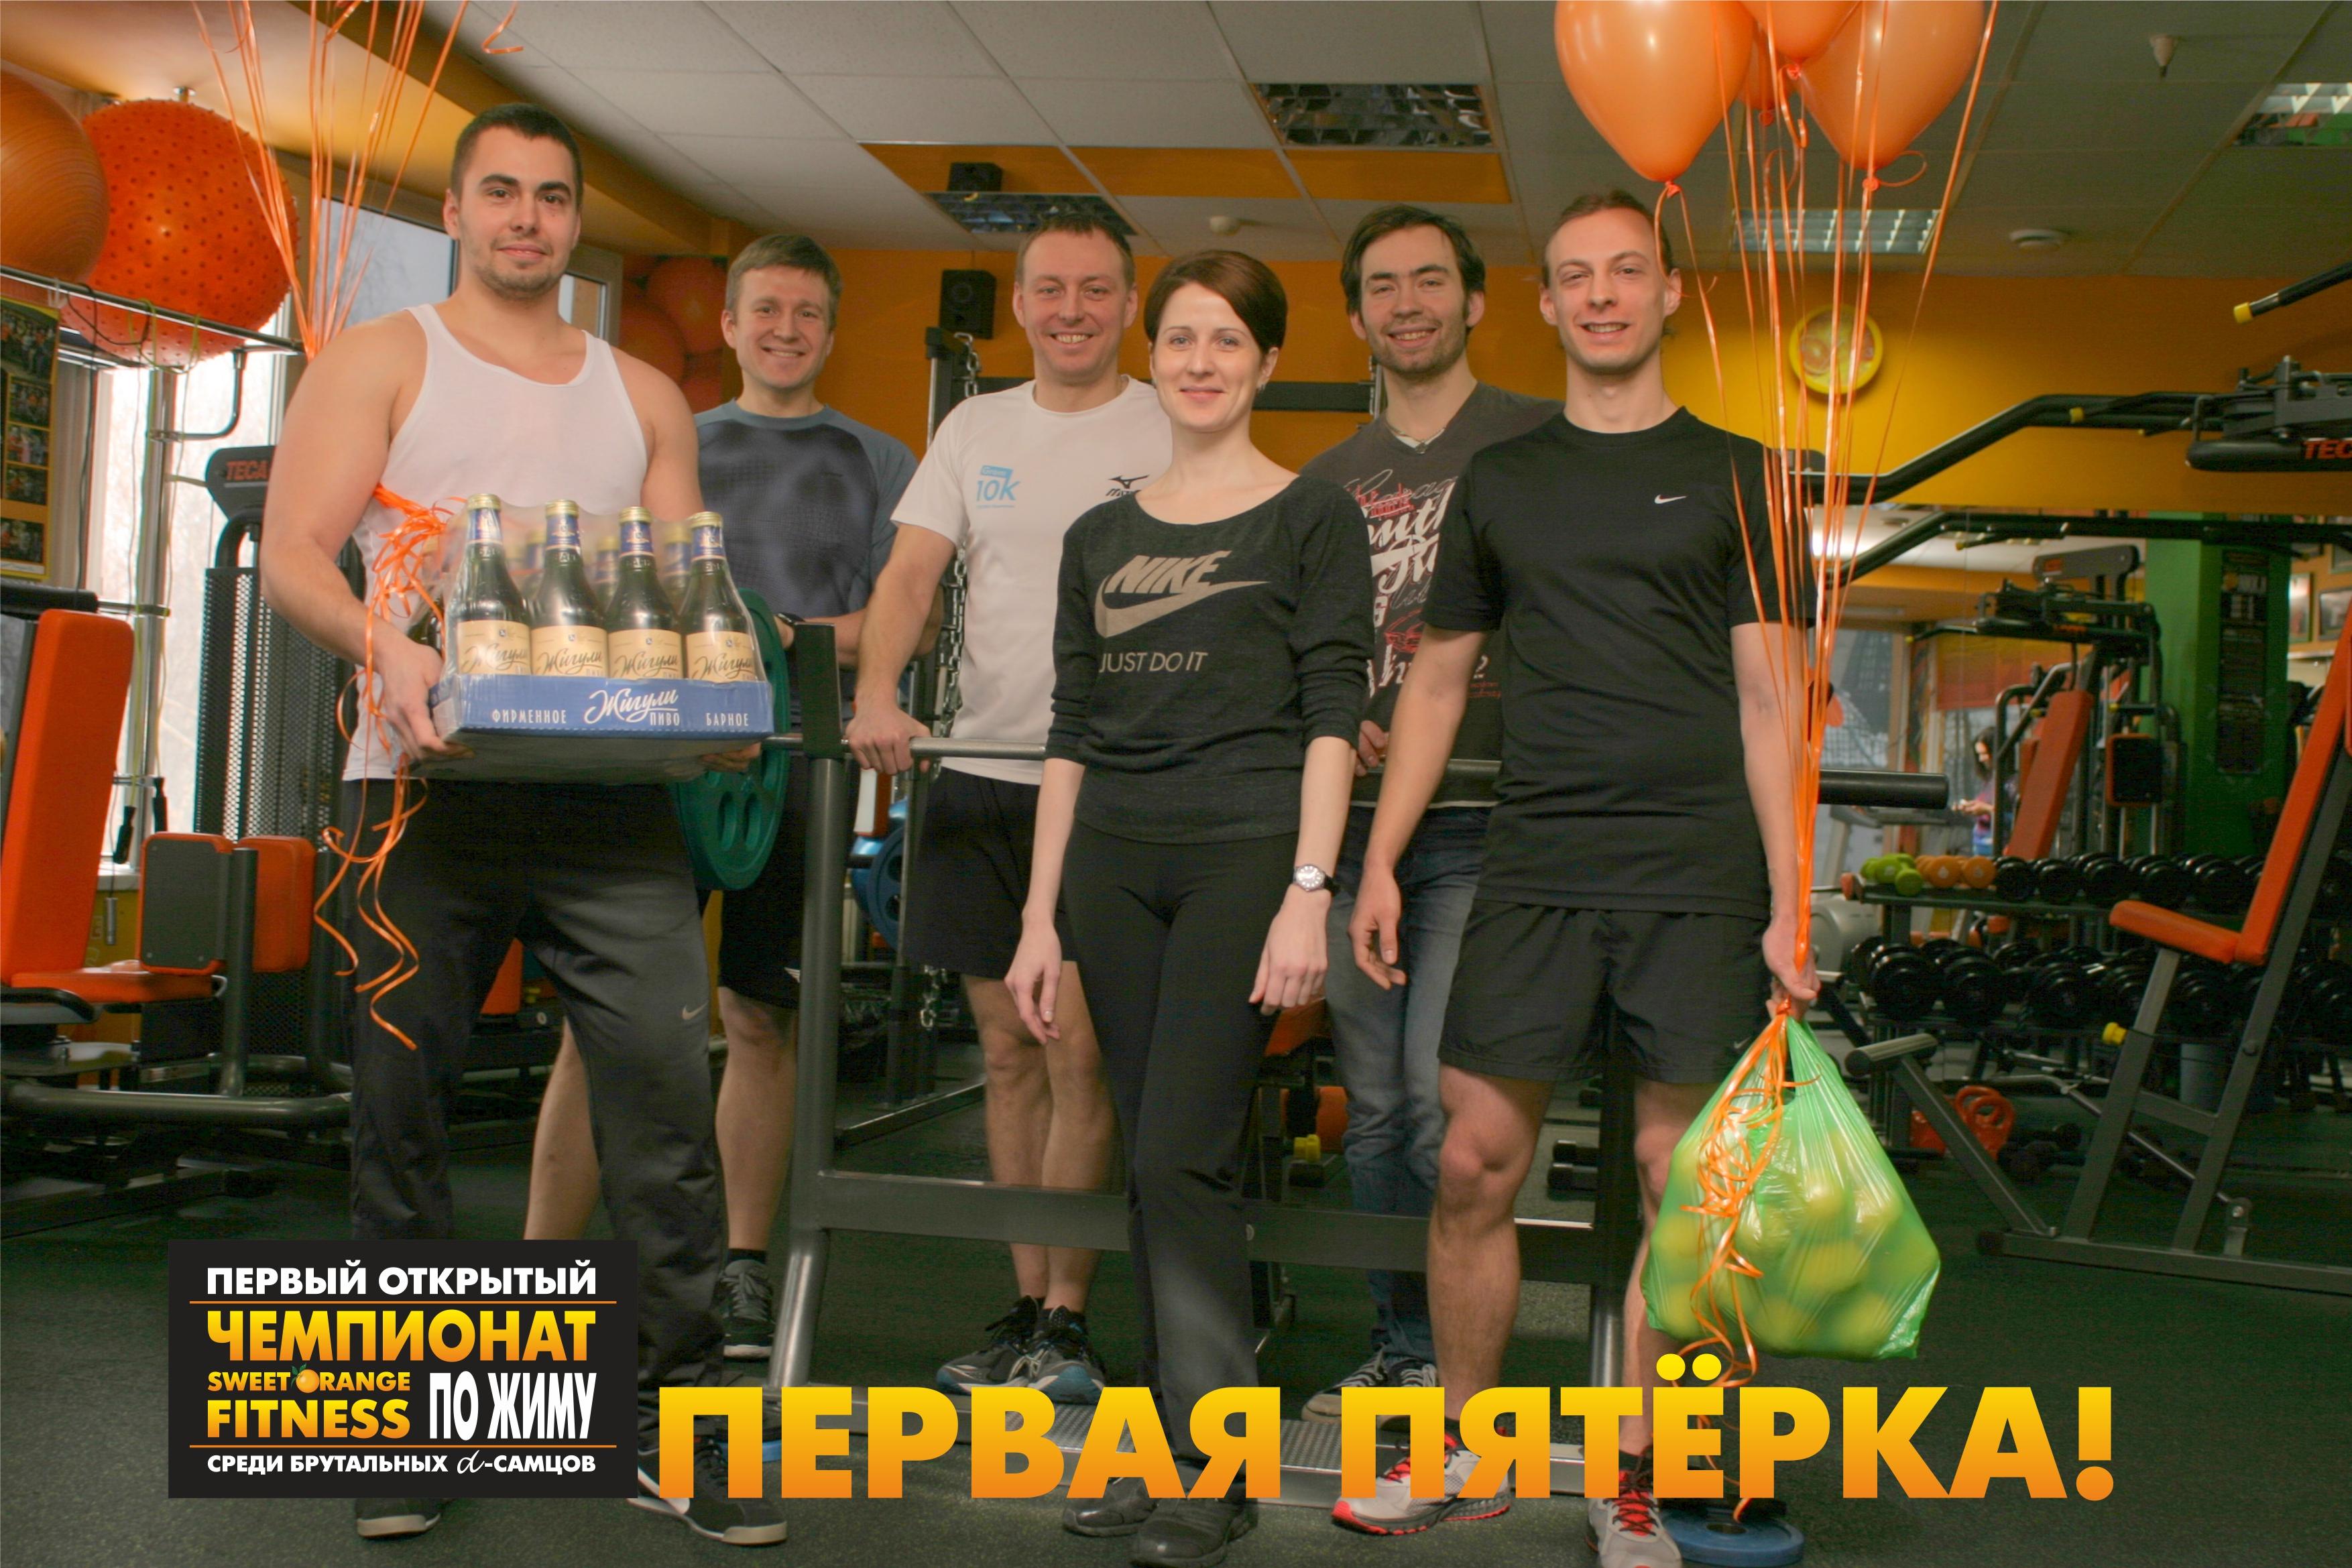 1я_пятёрка_чемпионатжим_16